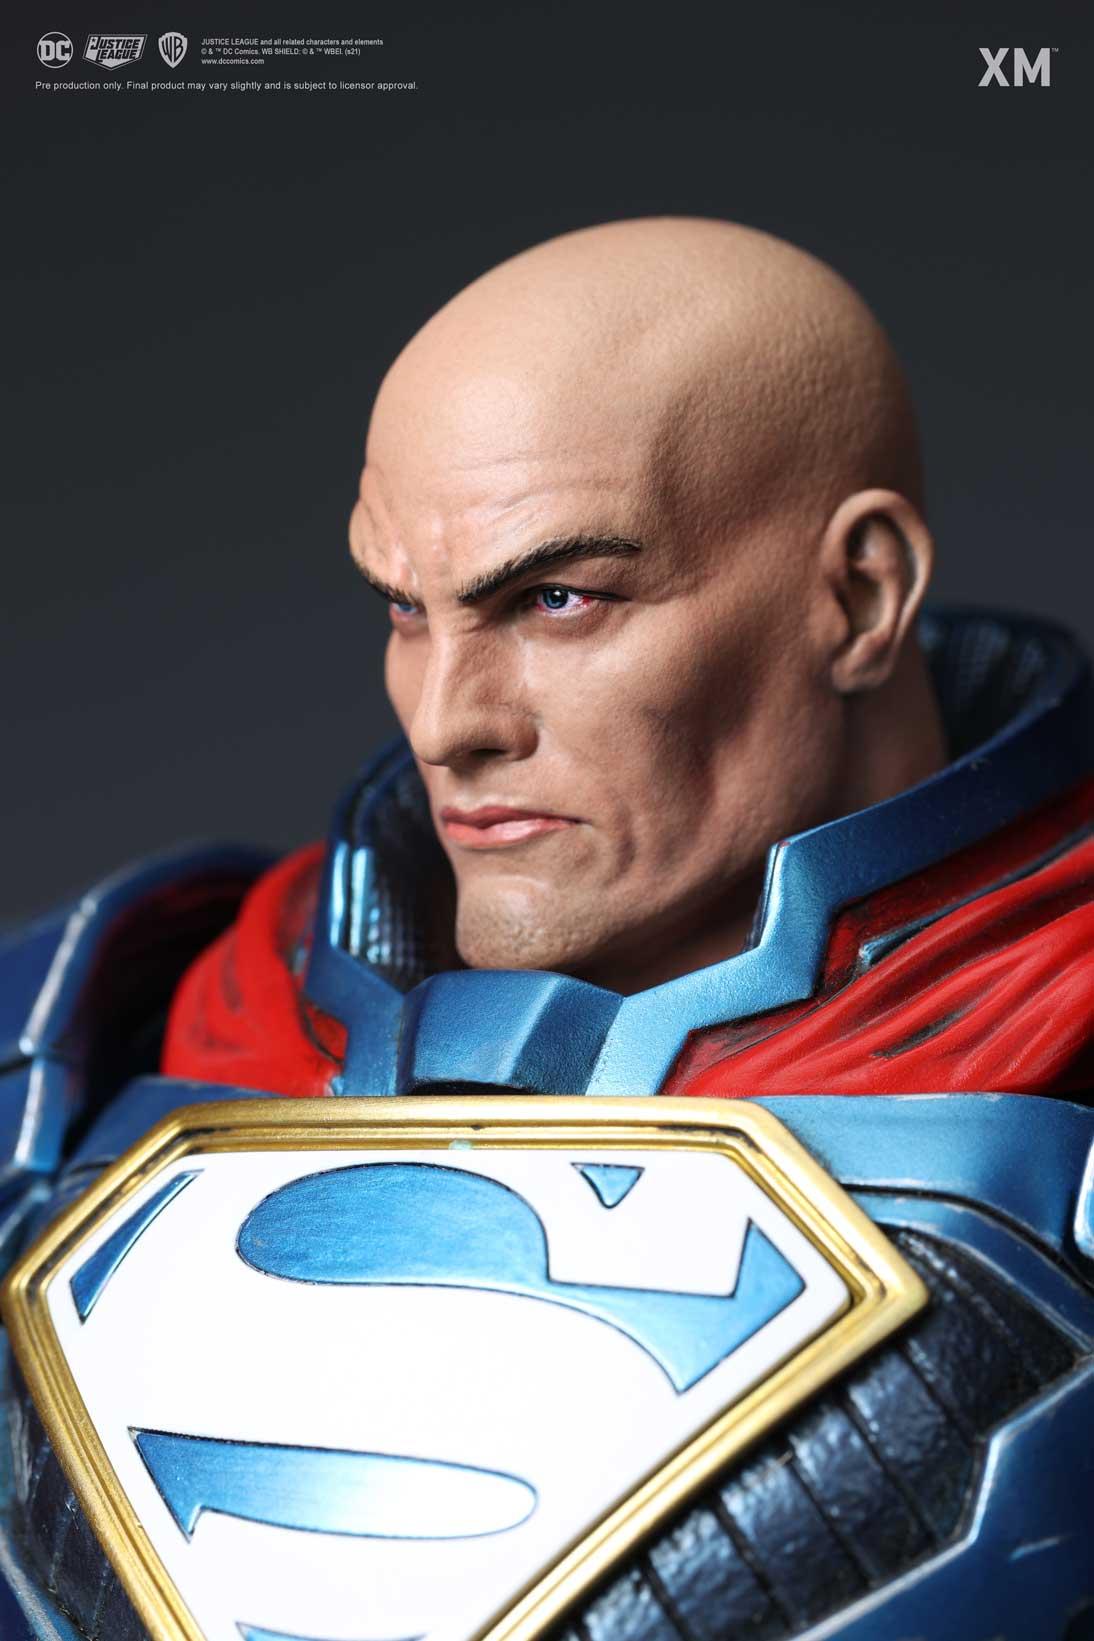 Link a Xm Studios_Lex_Luthor_Superman_DC- (15)